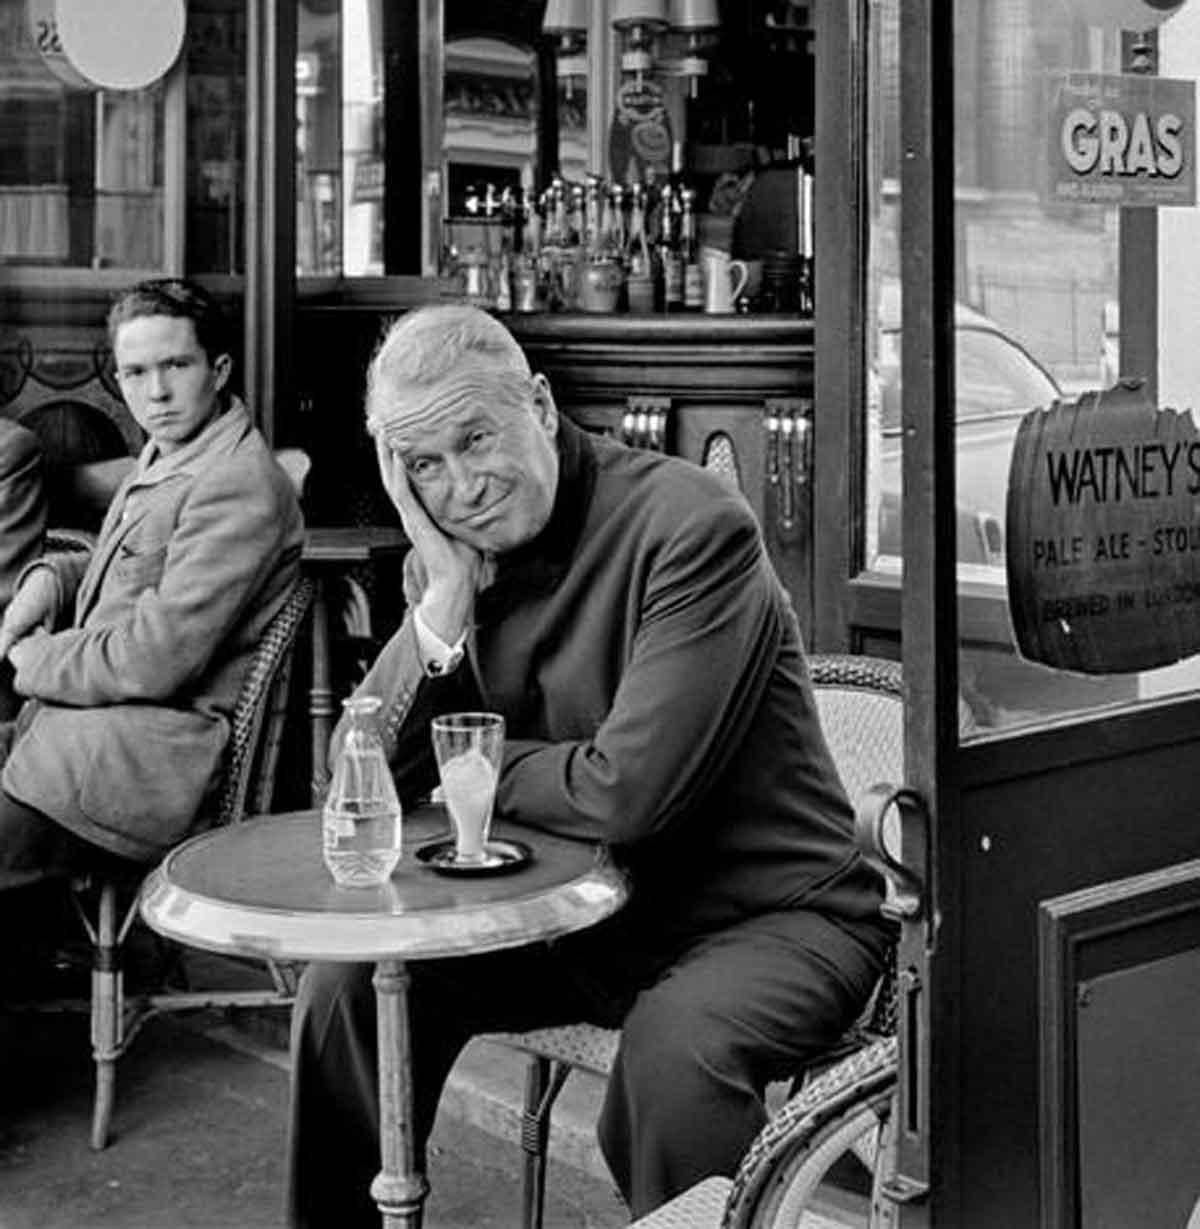 1954-Maurice-CHEVALIER---Paris-cafe